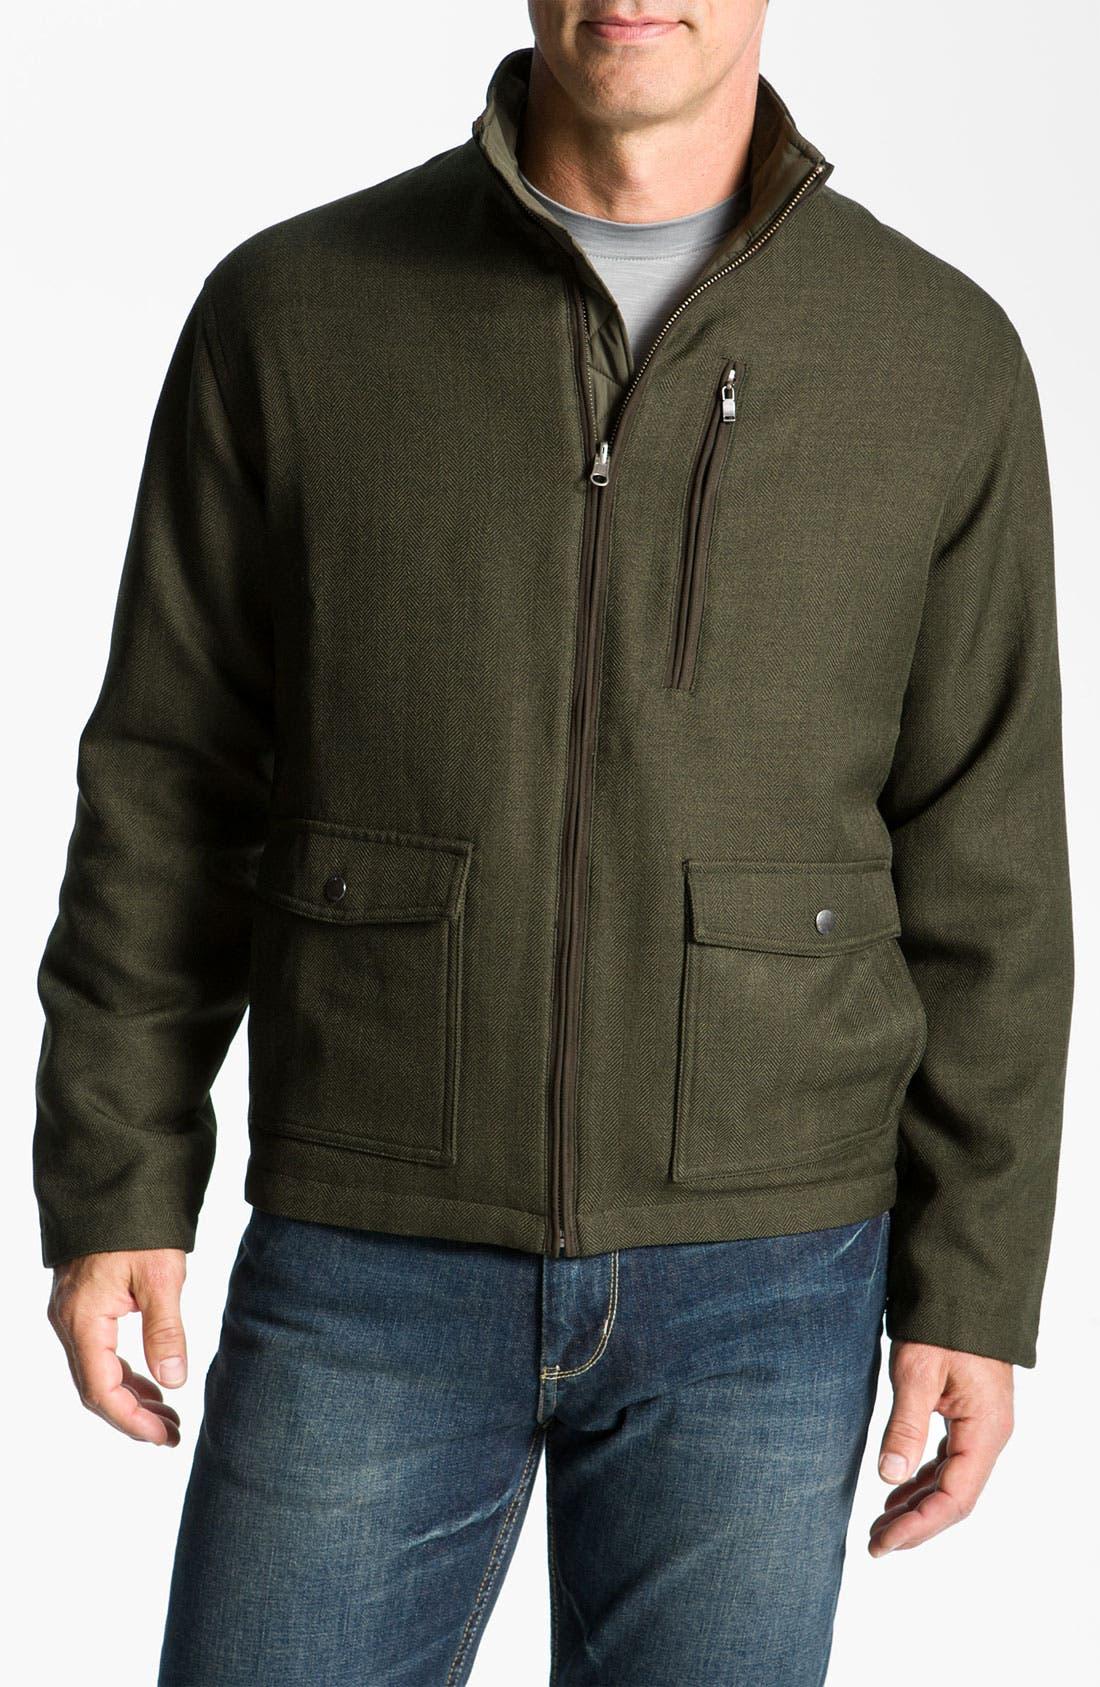 Alternate Image 1 Selected - Cutter & Buck 'Weathertec Bearsden' Reversible Jacket (Big & Tall)